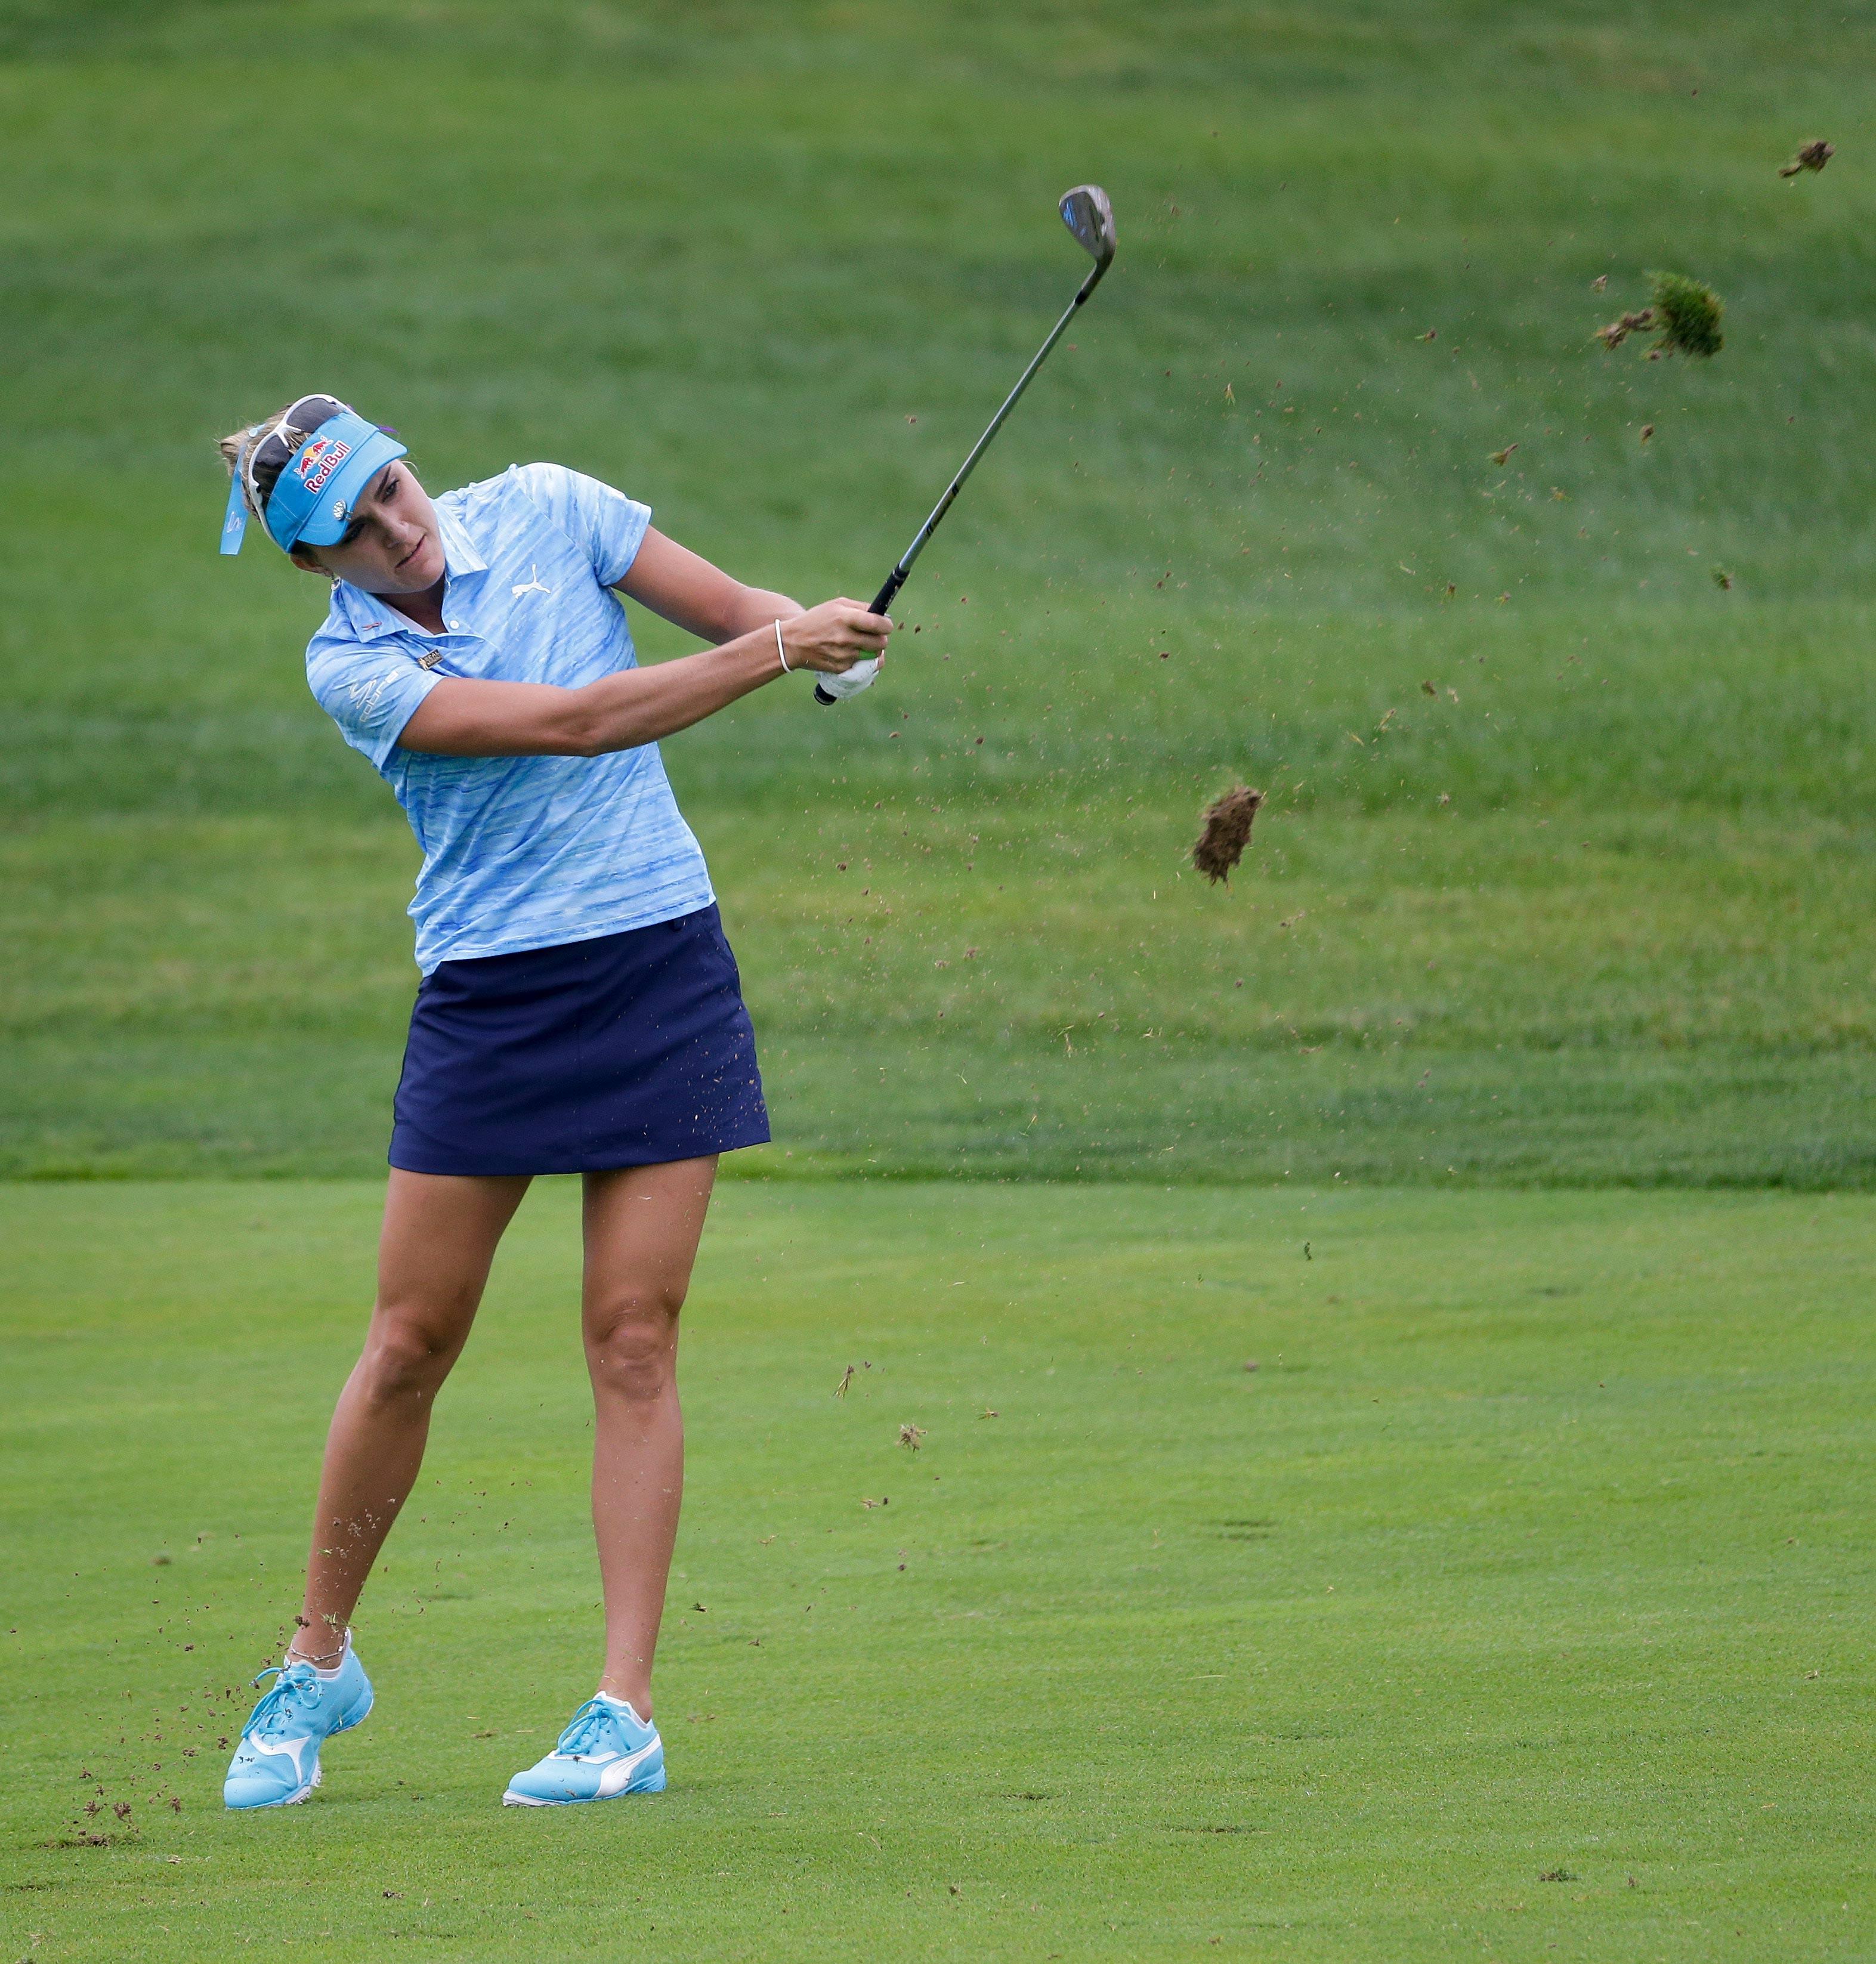 Otra imagen de la estadounidense Lexi Thompson en el U.S. Women's Open. Foto AP?